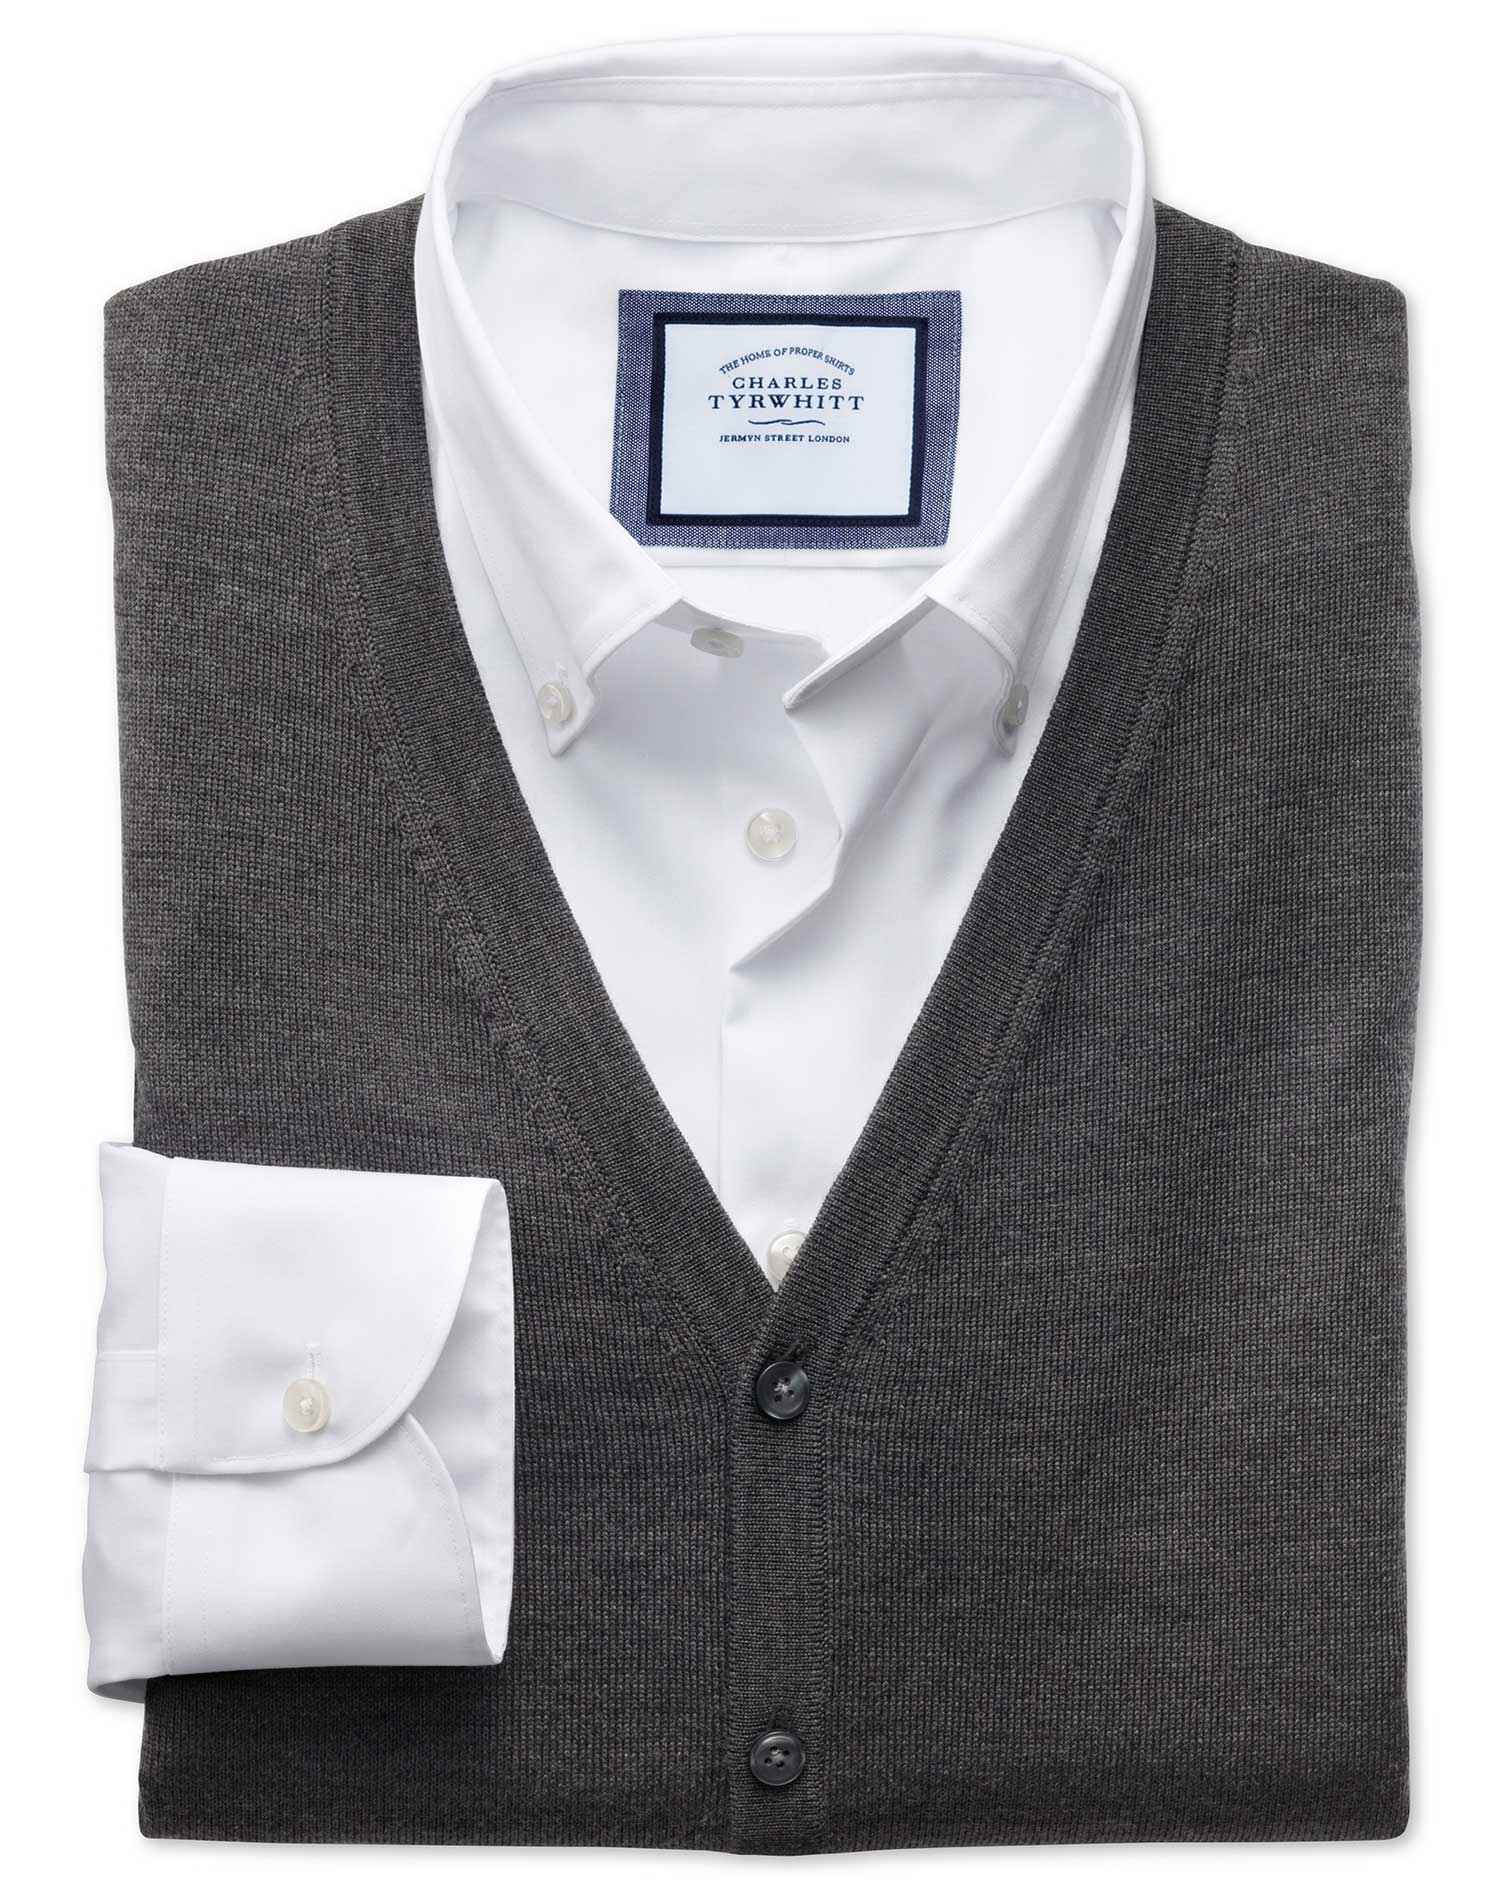 Charcoal Merino Wool Waistcoat Size Large by Charles Tyrwhitt